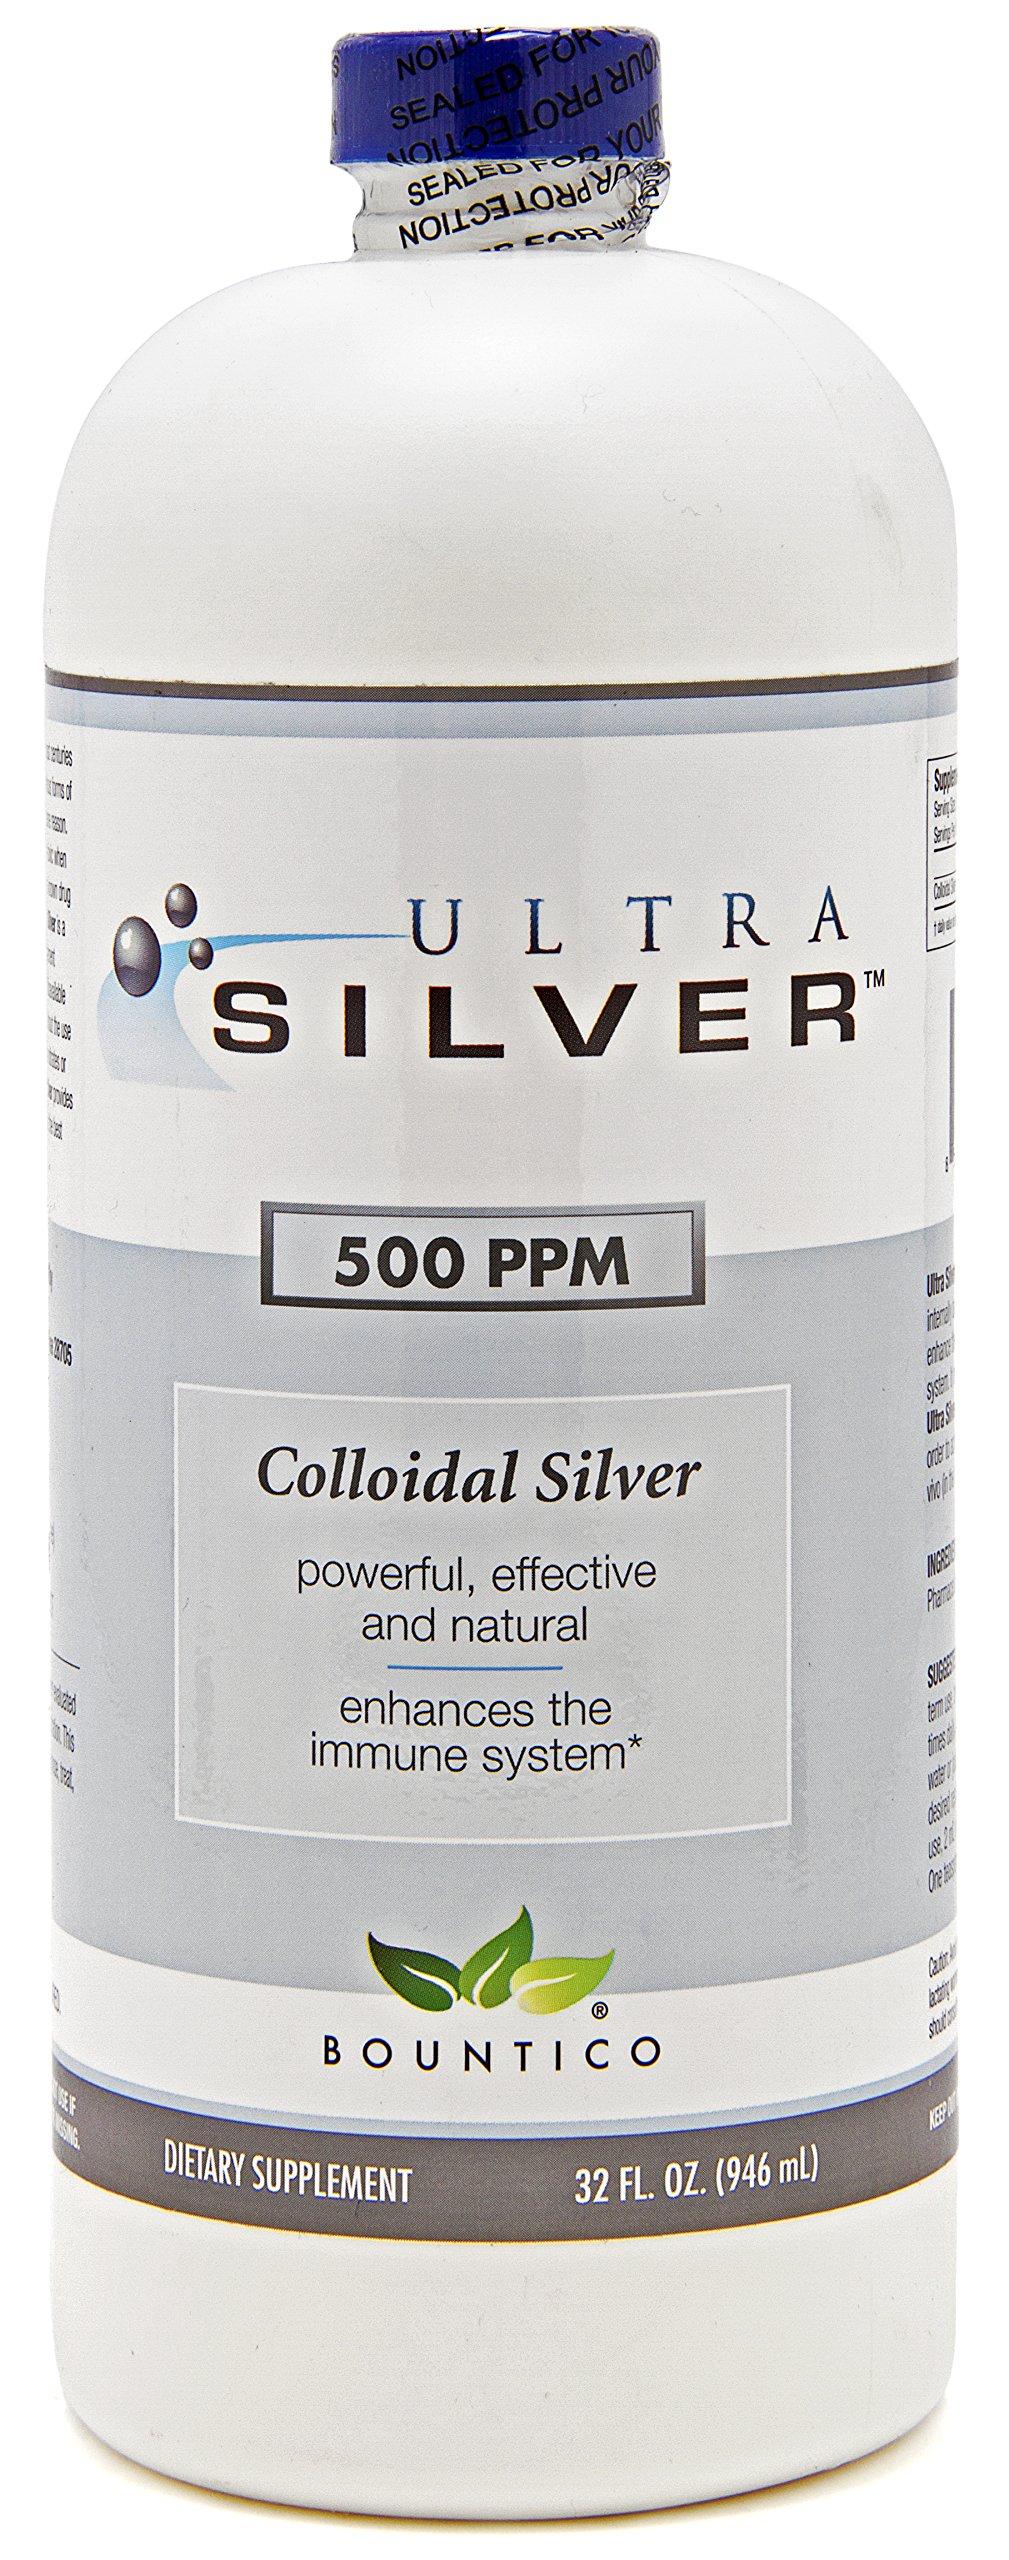 Ultra Silver Colloidal Silver 500 PPM - 32 Oz by Ultra Silver